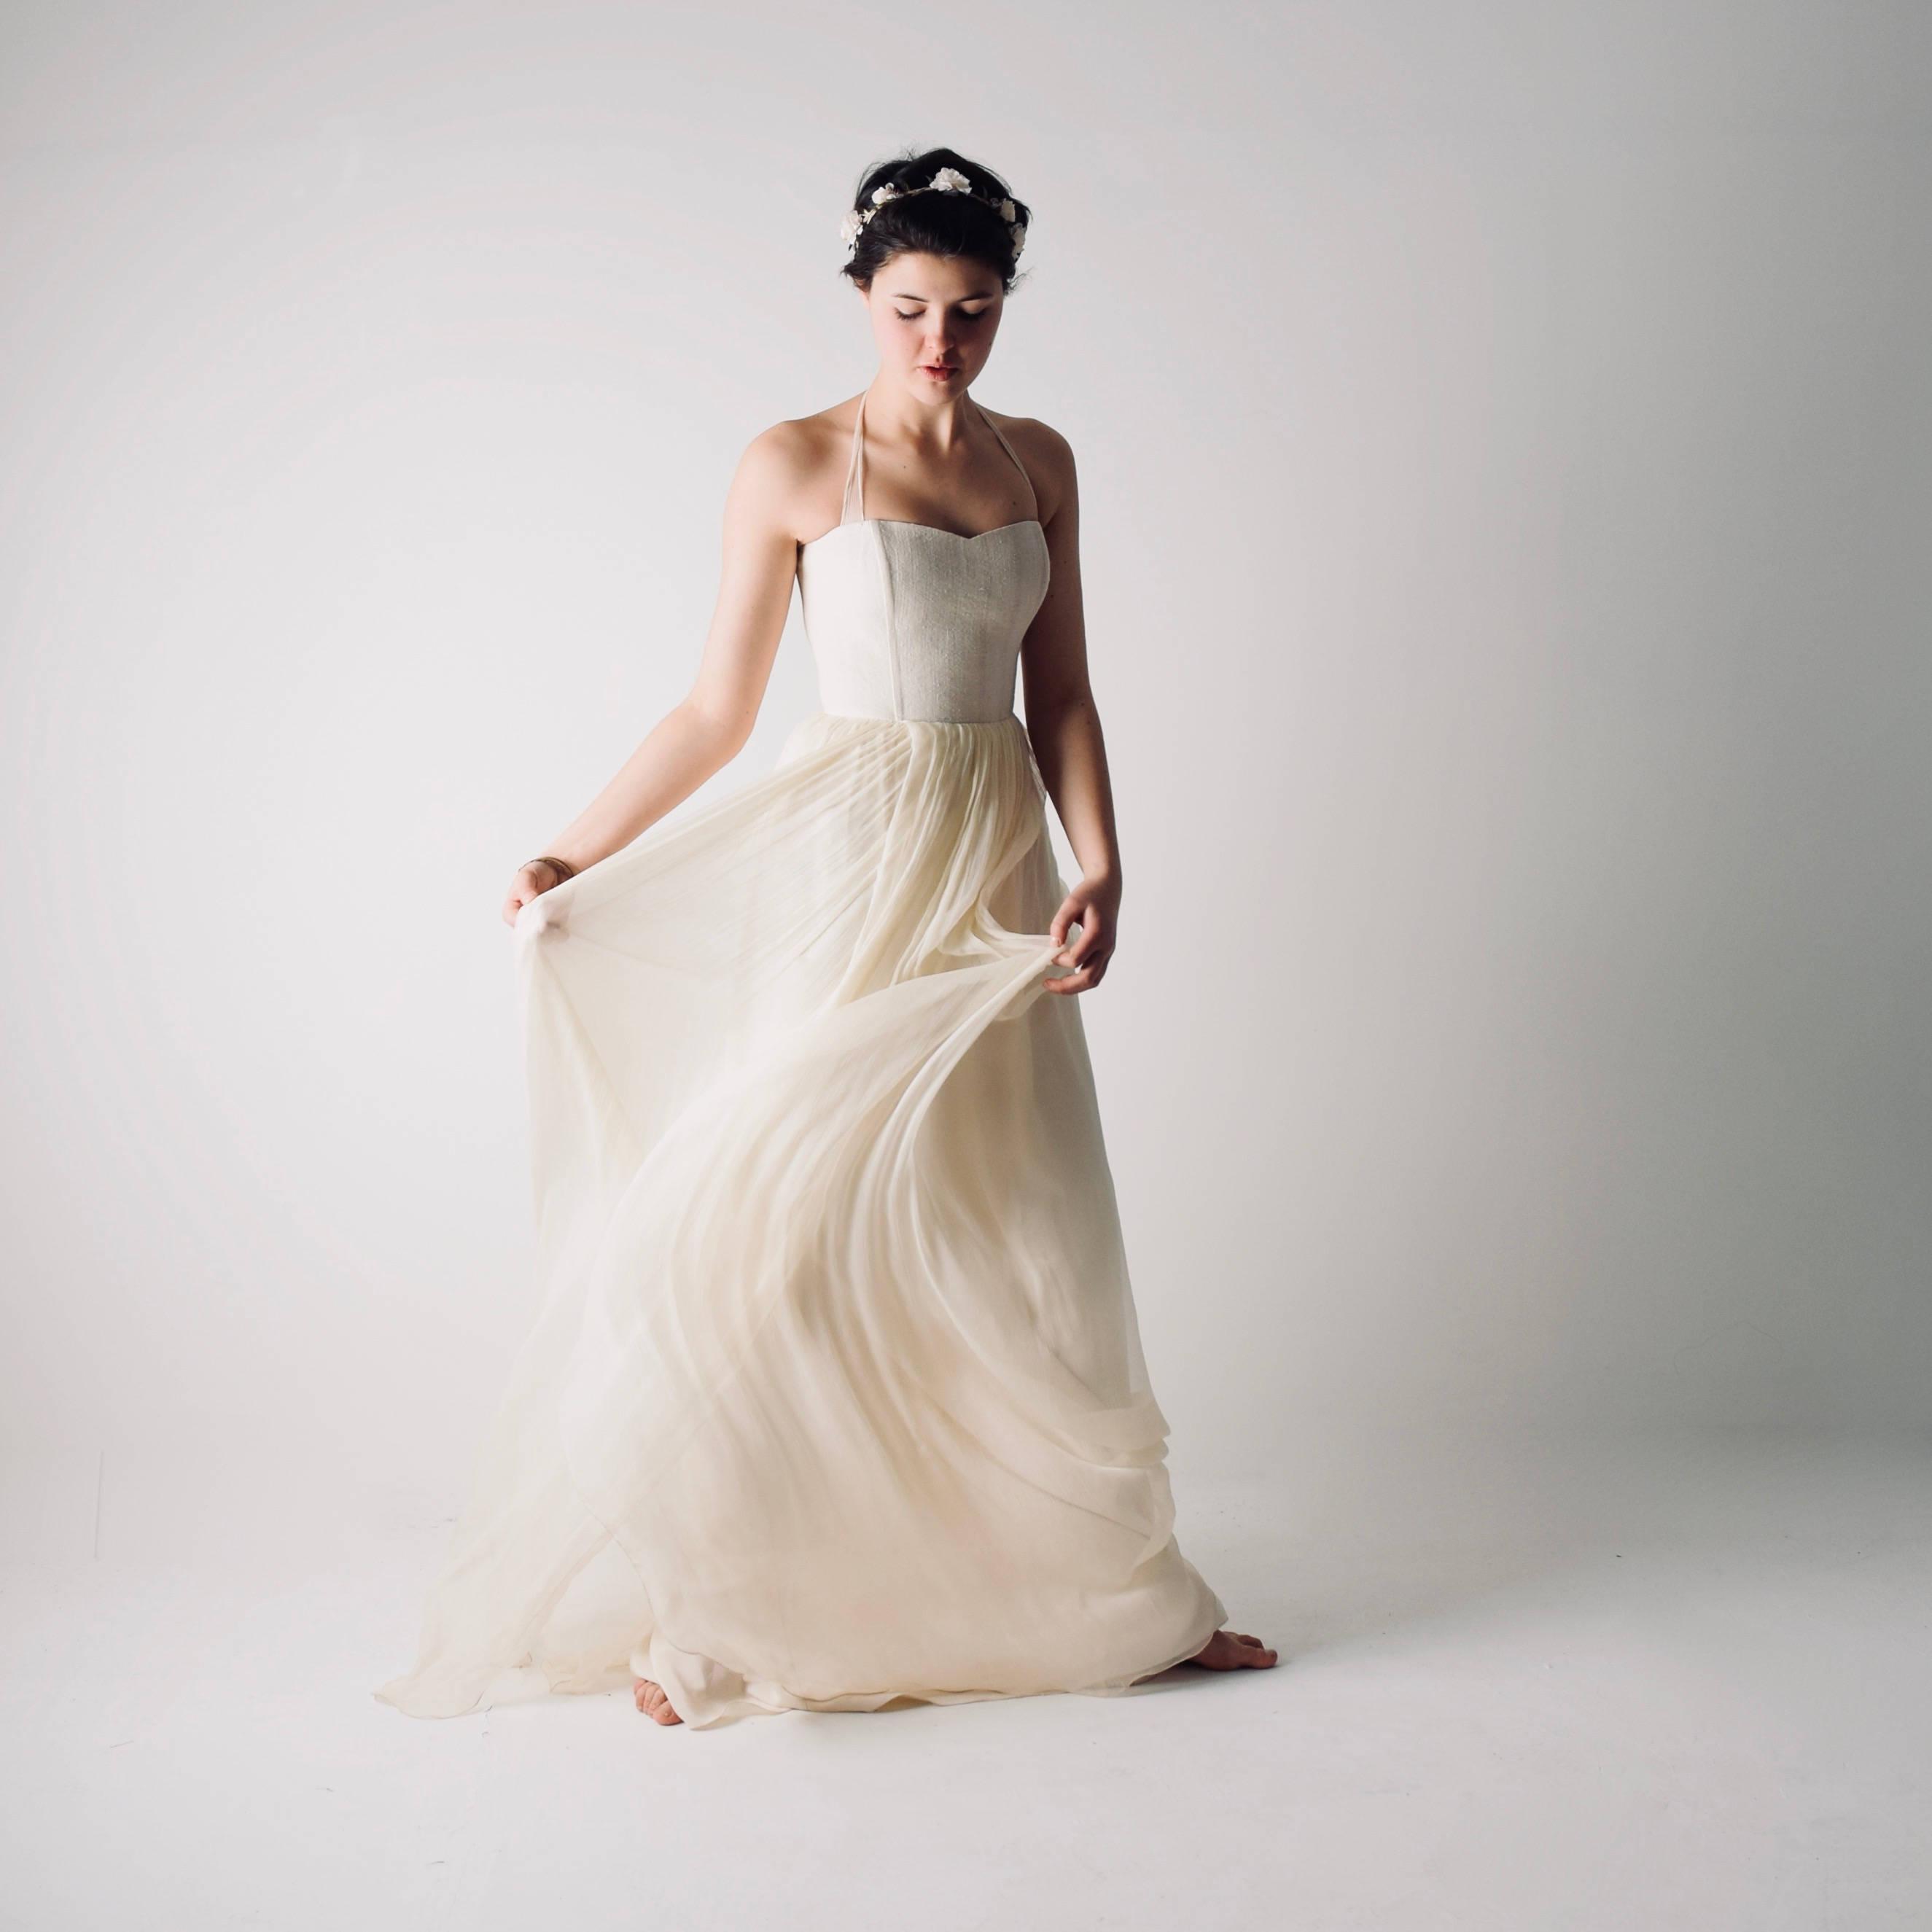 Silk Wedding Dress.Tilia Hemp And Silk Wedding Dress